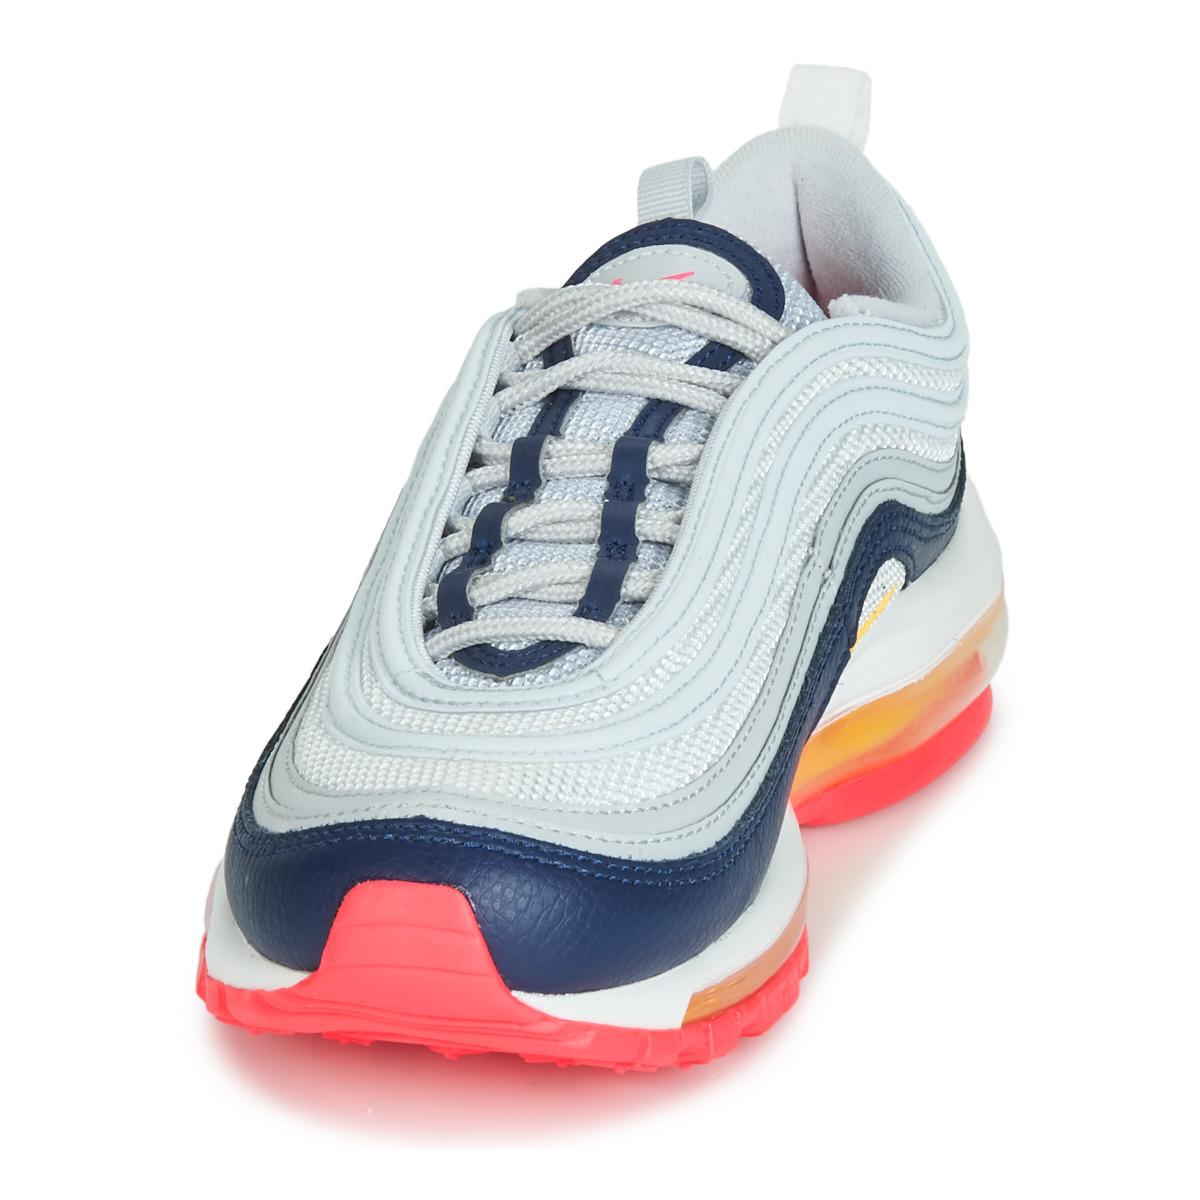 Nike AIR MAX 97 W Bianco 9929587 Consegna Gratuita OutletScarpeOnline.it